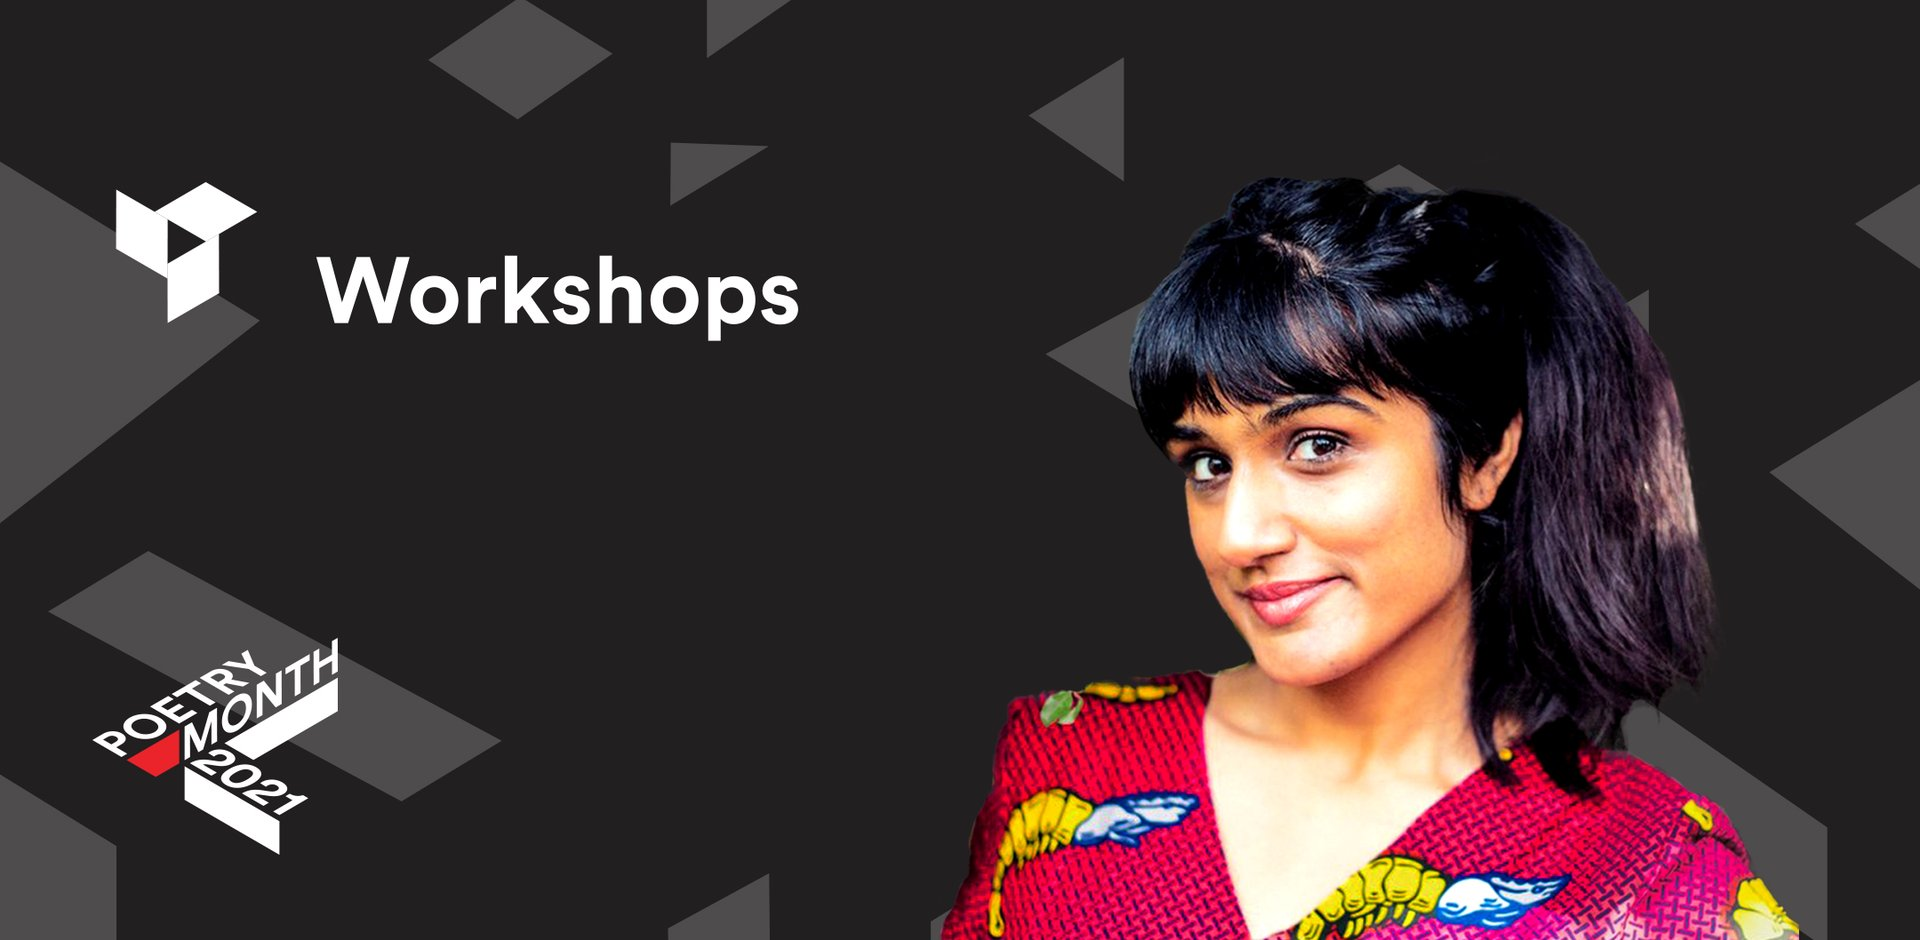 Workshop-Banner-Vidya-Rajan.jpg